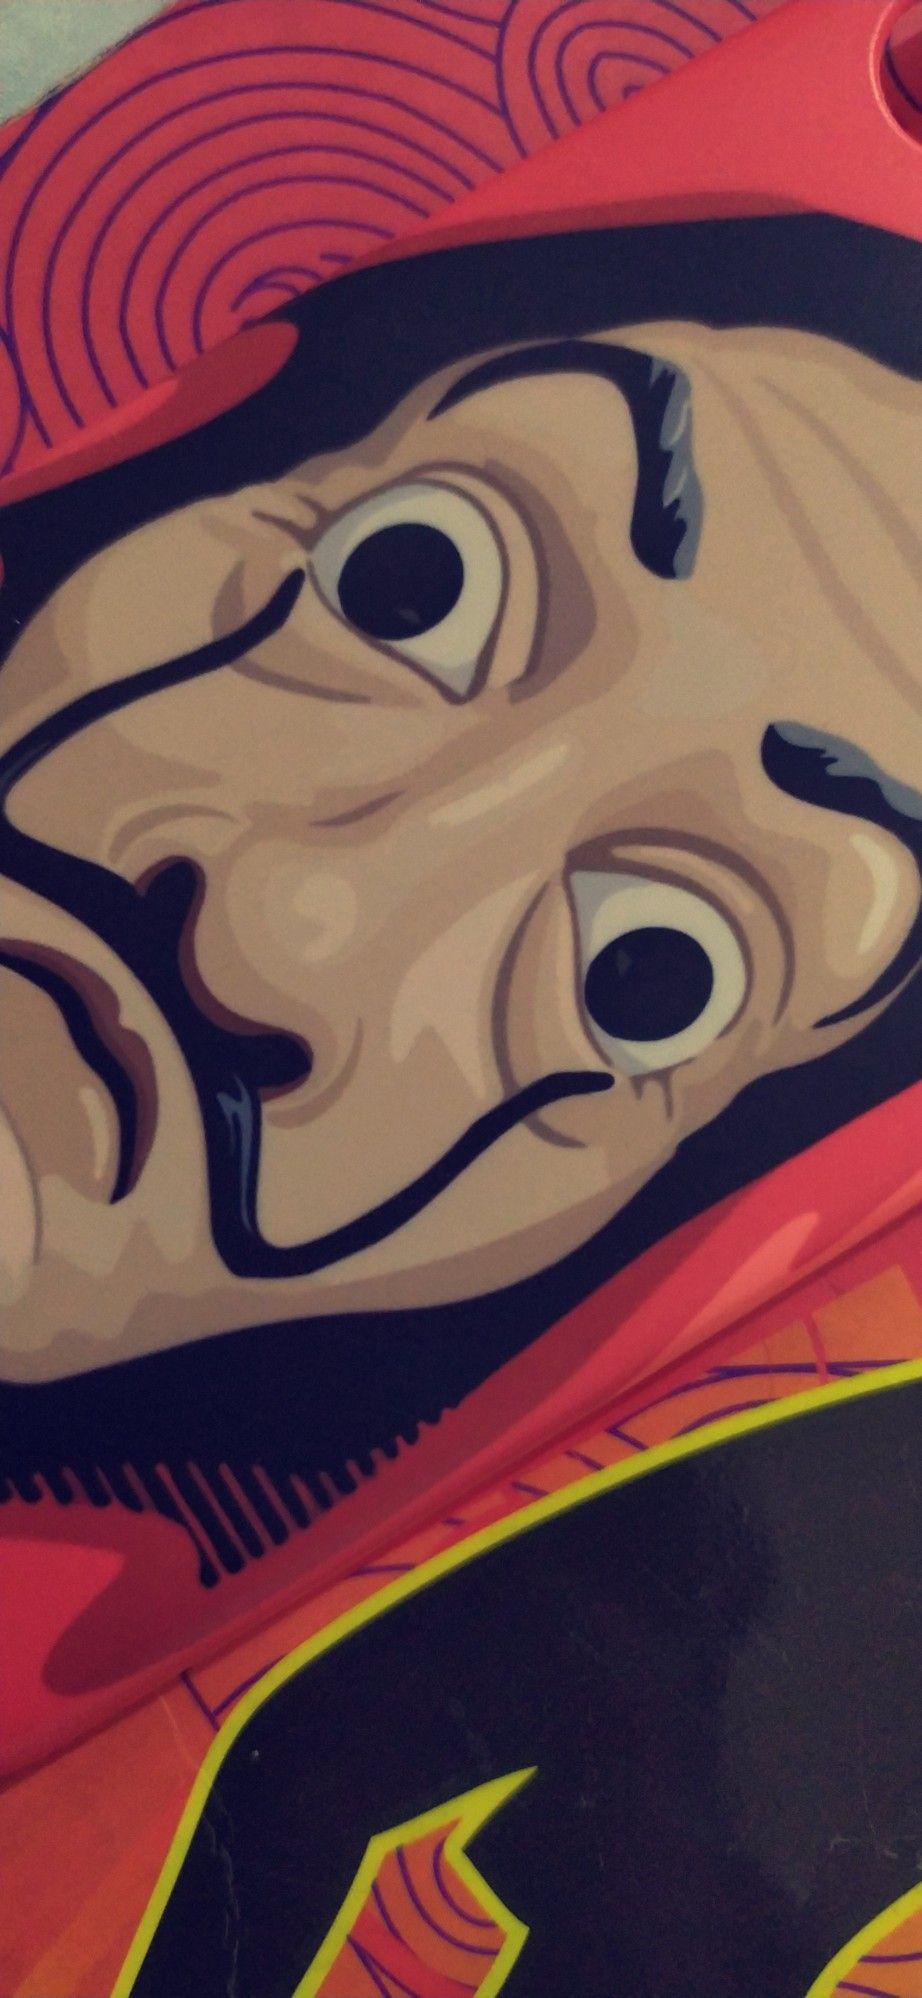 Money Heist Dali Mask Salvador Dali Art Dali Art Art Iphone money heist mask wallpaper hd